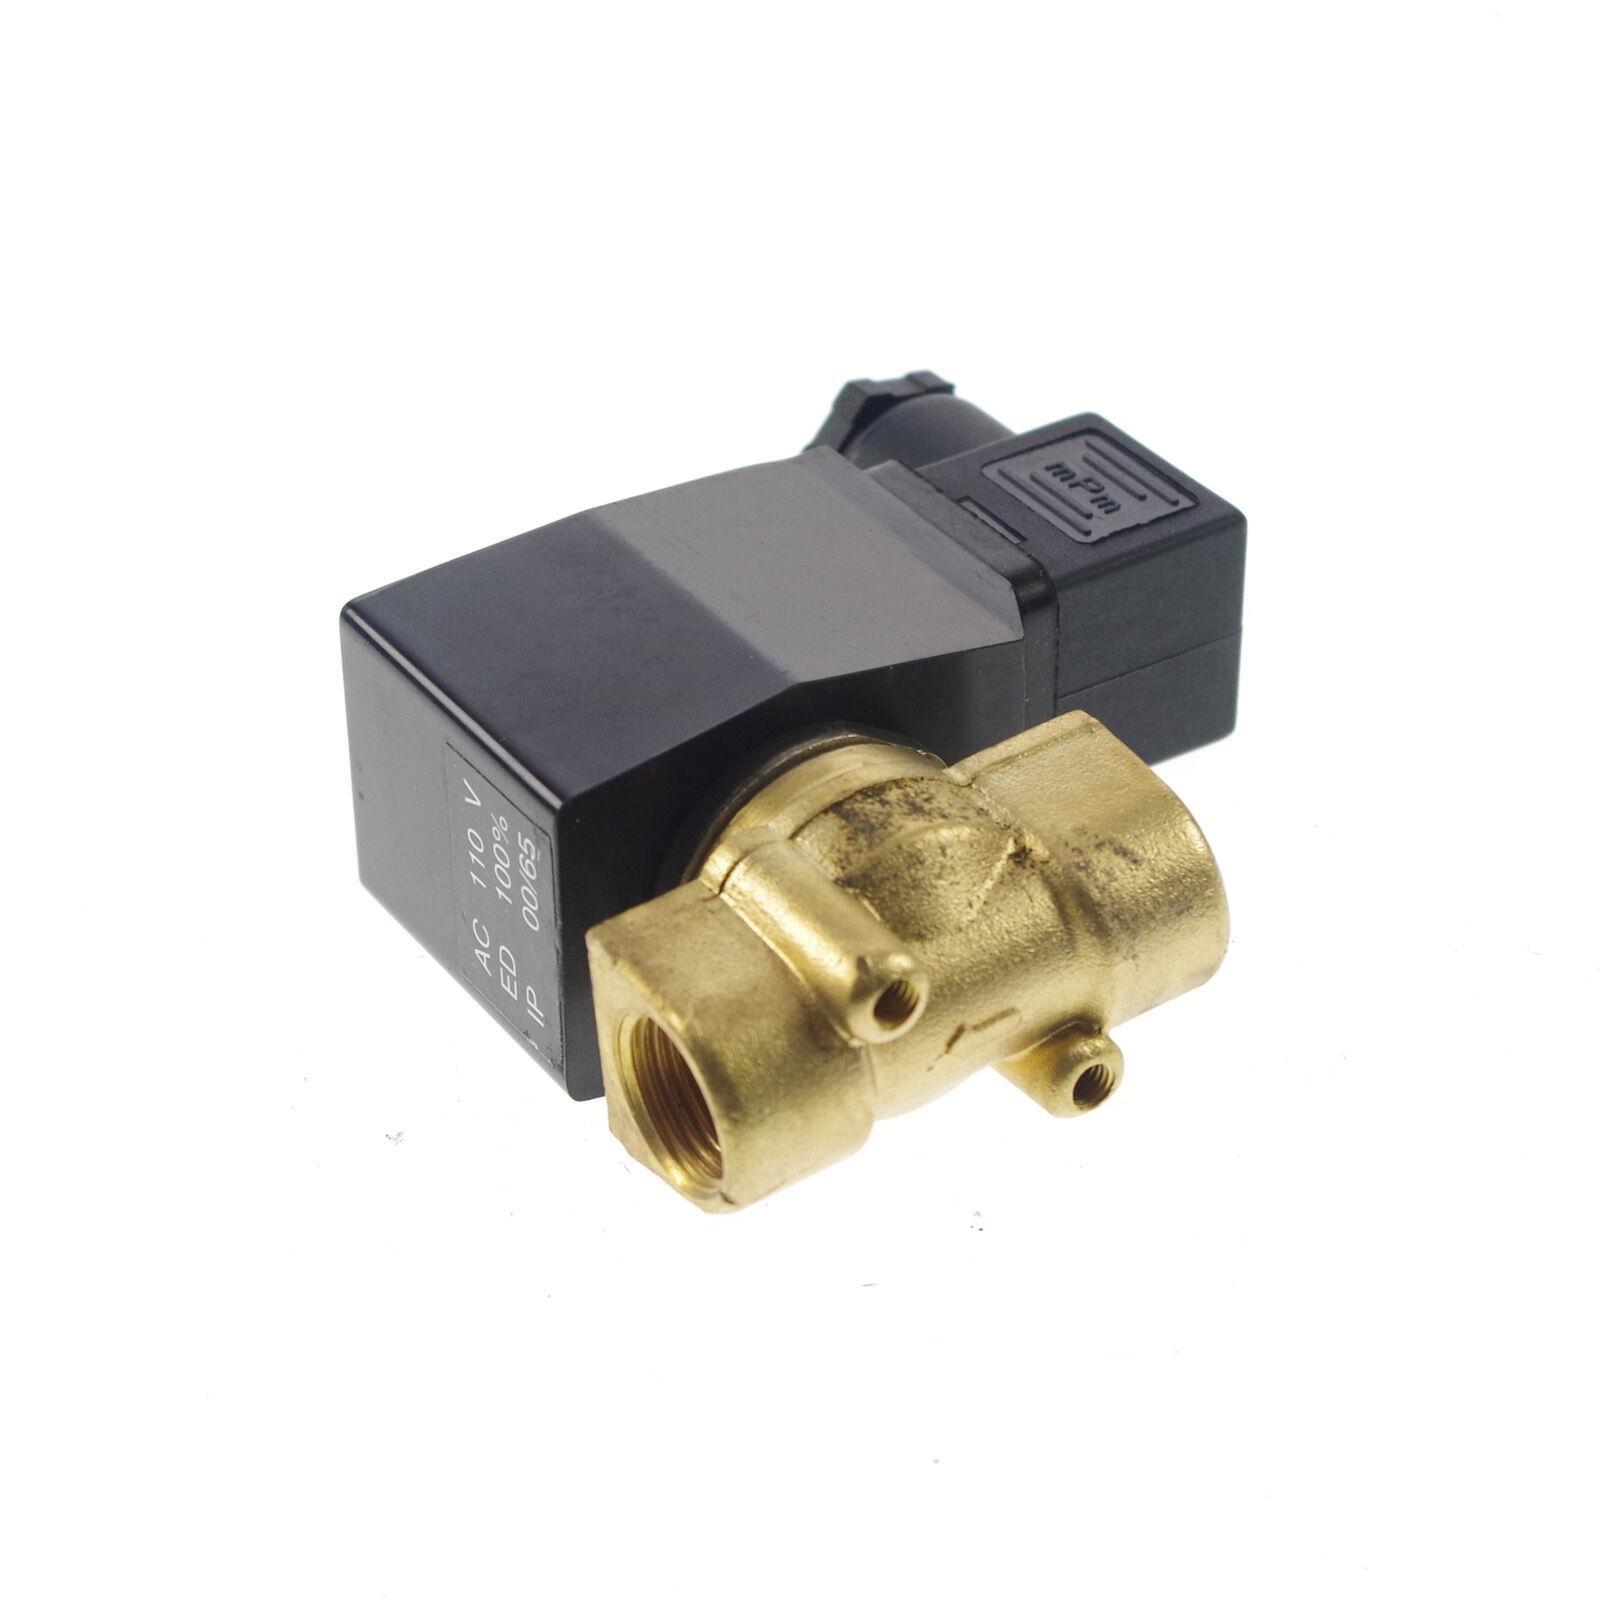 "1"" BSPP NC Flow Bore 25mm Brass 12/24VDC 110/220VAC Methane Propane 2 Ways Solenoid Valve Gas Fuel Air Water 1.0Mpa"